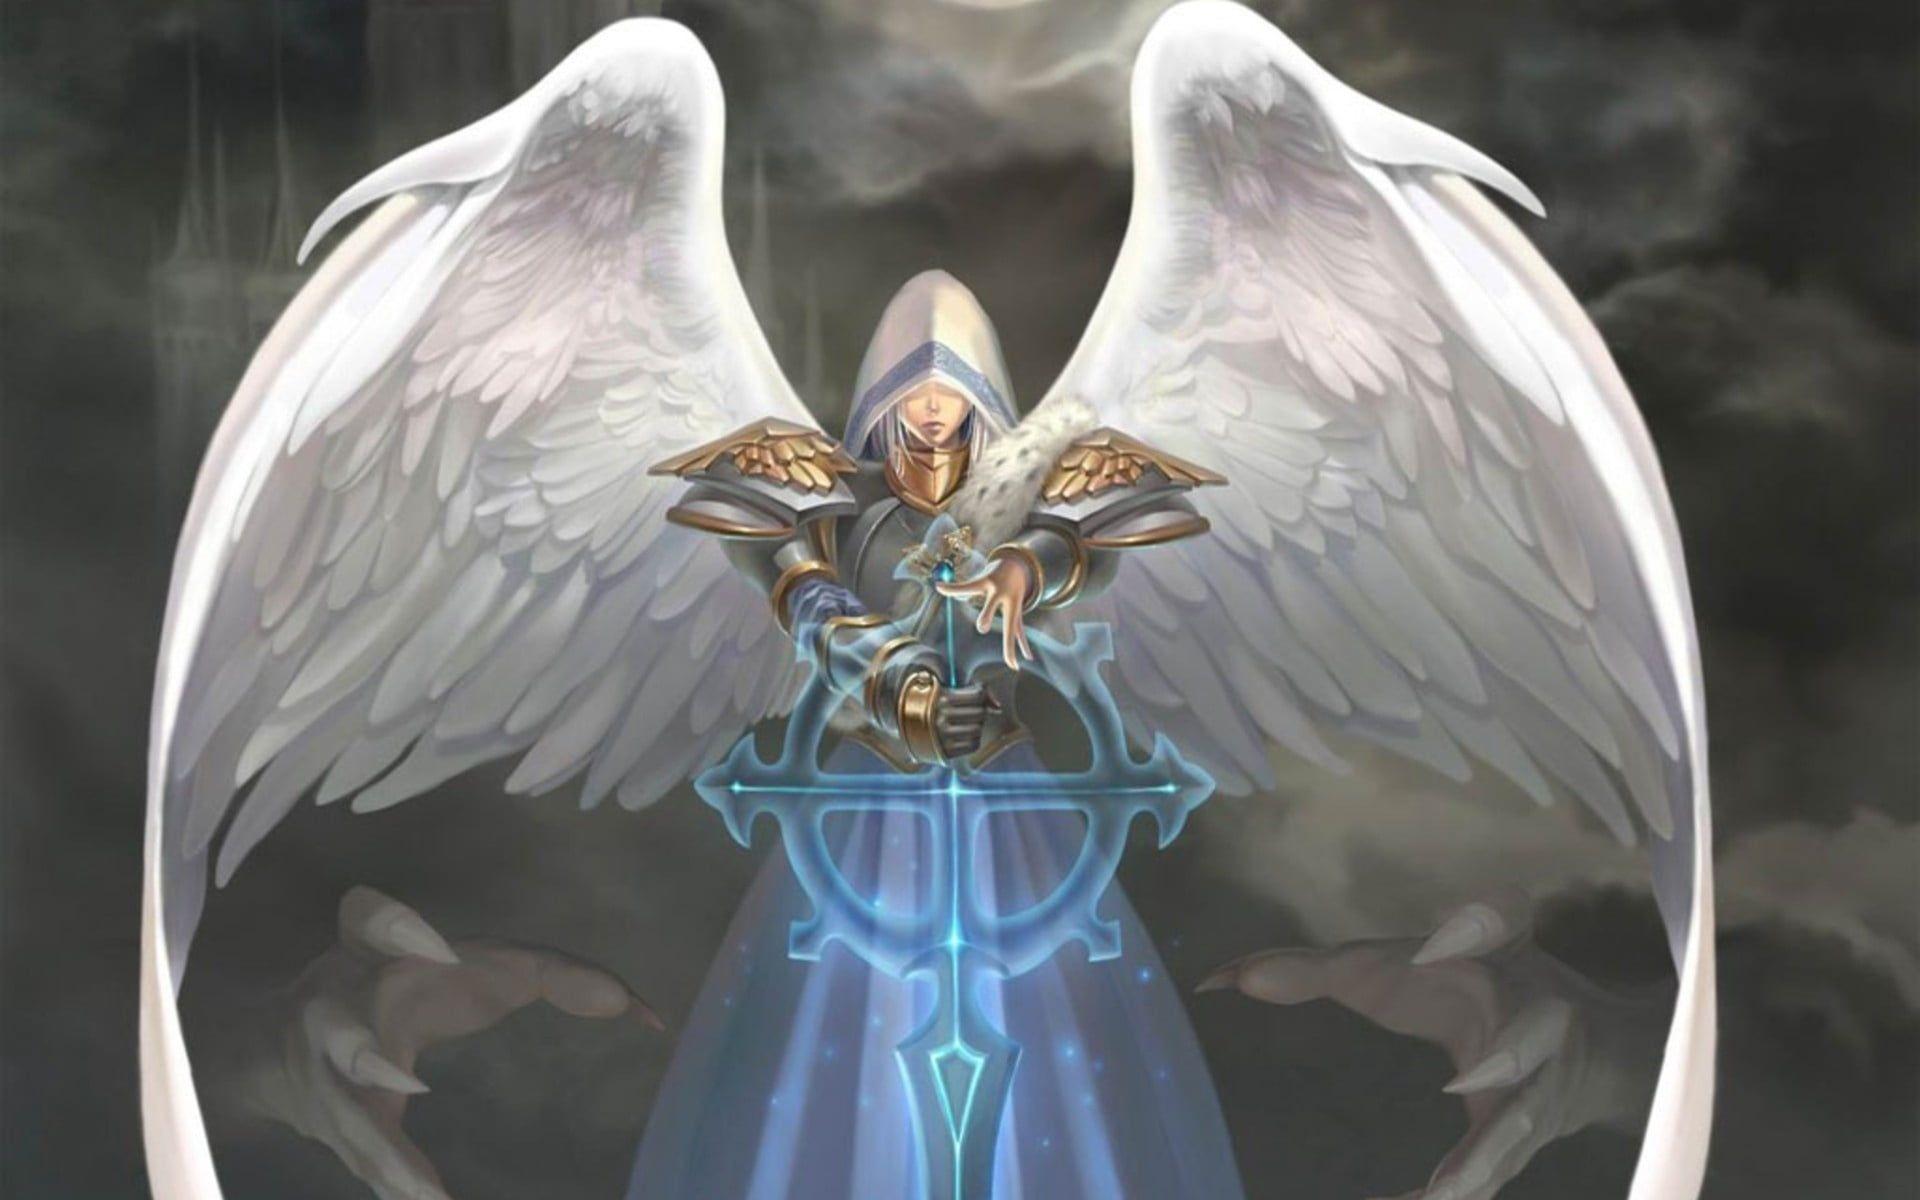 Angel Character Holding Sword Illustration Might And Magic Heroes Warrior Armor Sword Wings 1080p Wallpaper Hdwallpaper Deskto Art Archangels Magic Art